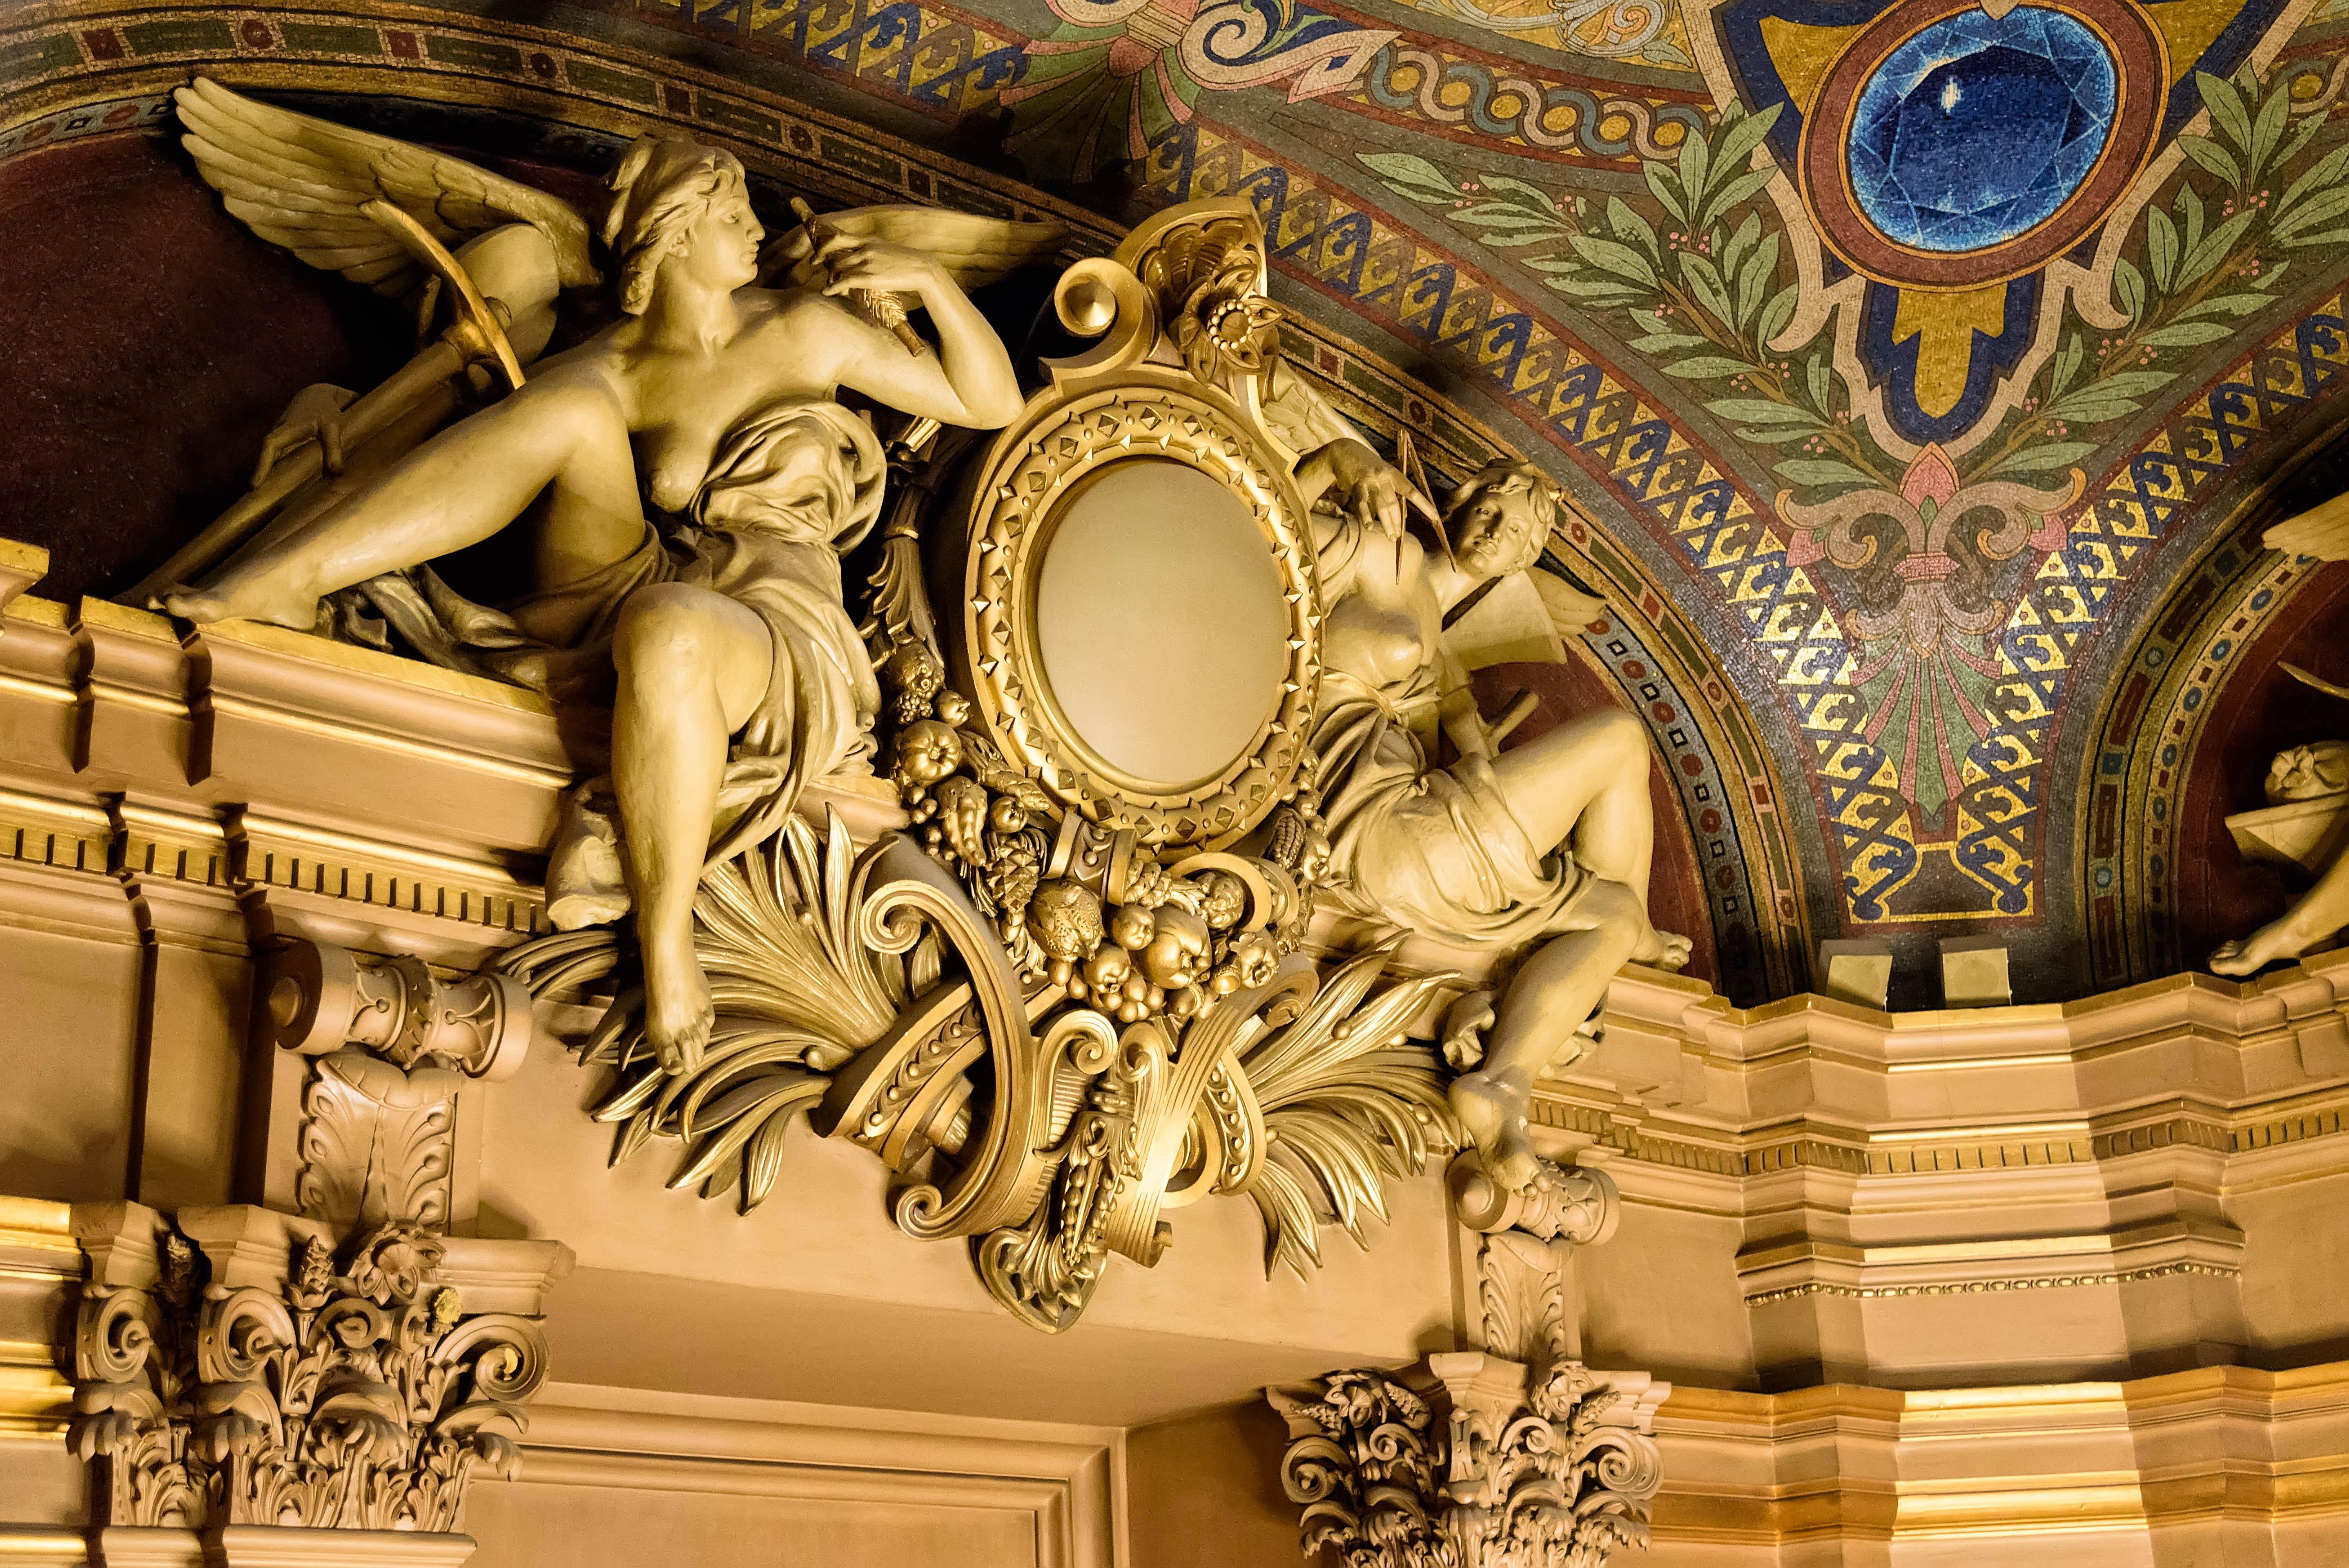 Filedecoration In The Opera Garnier In Paris July 2015jpg